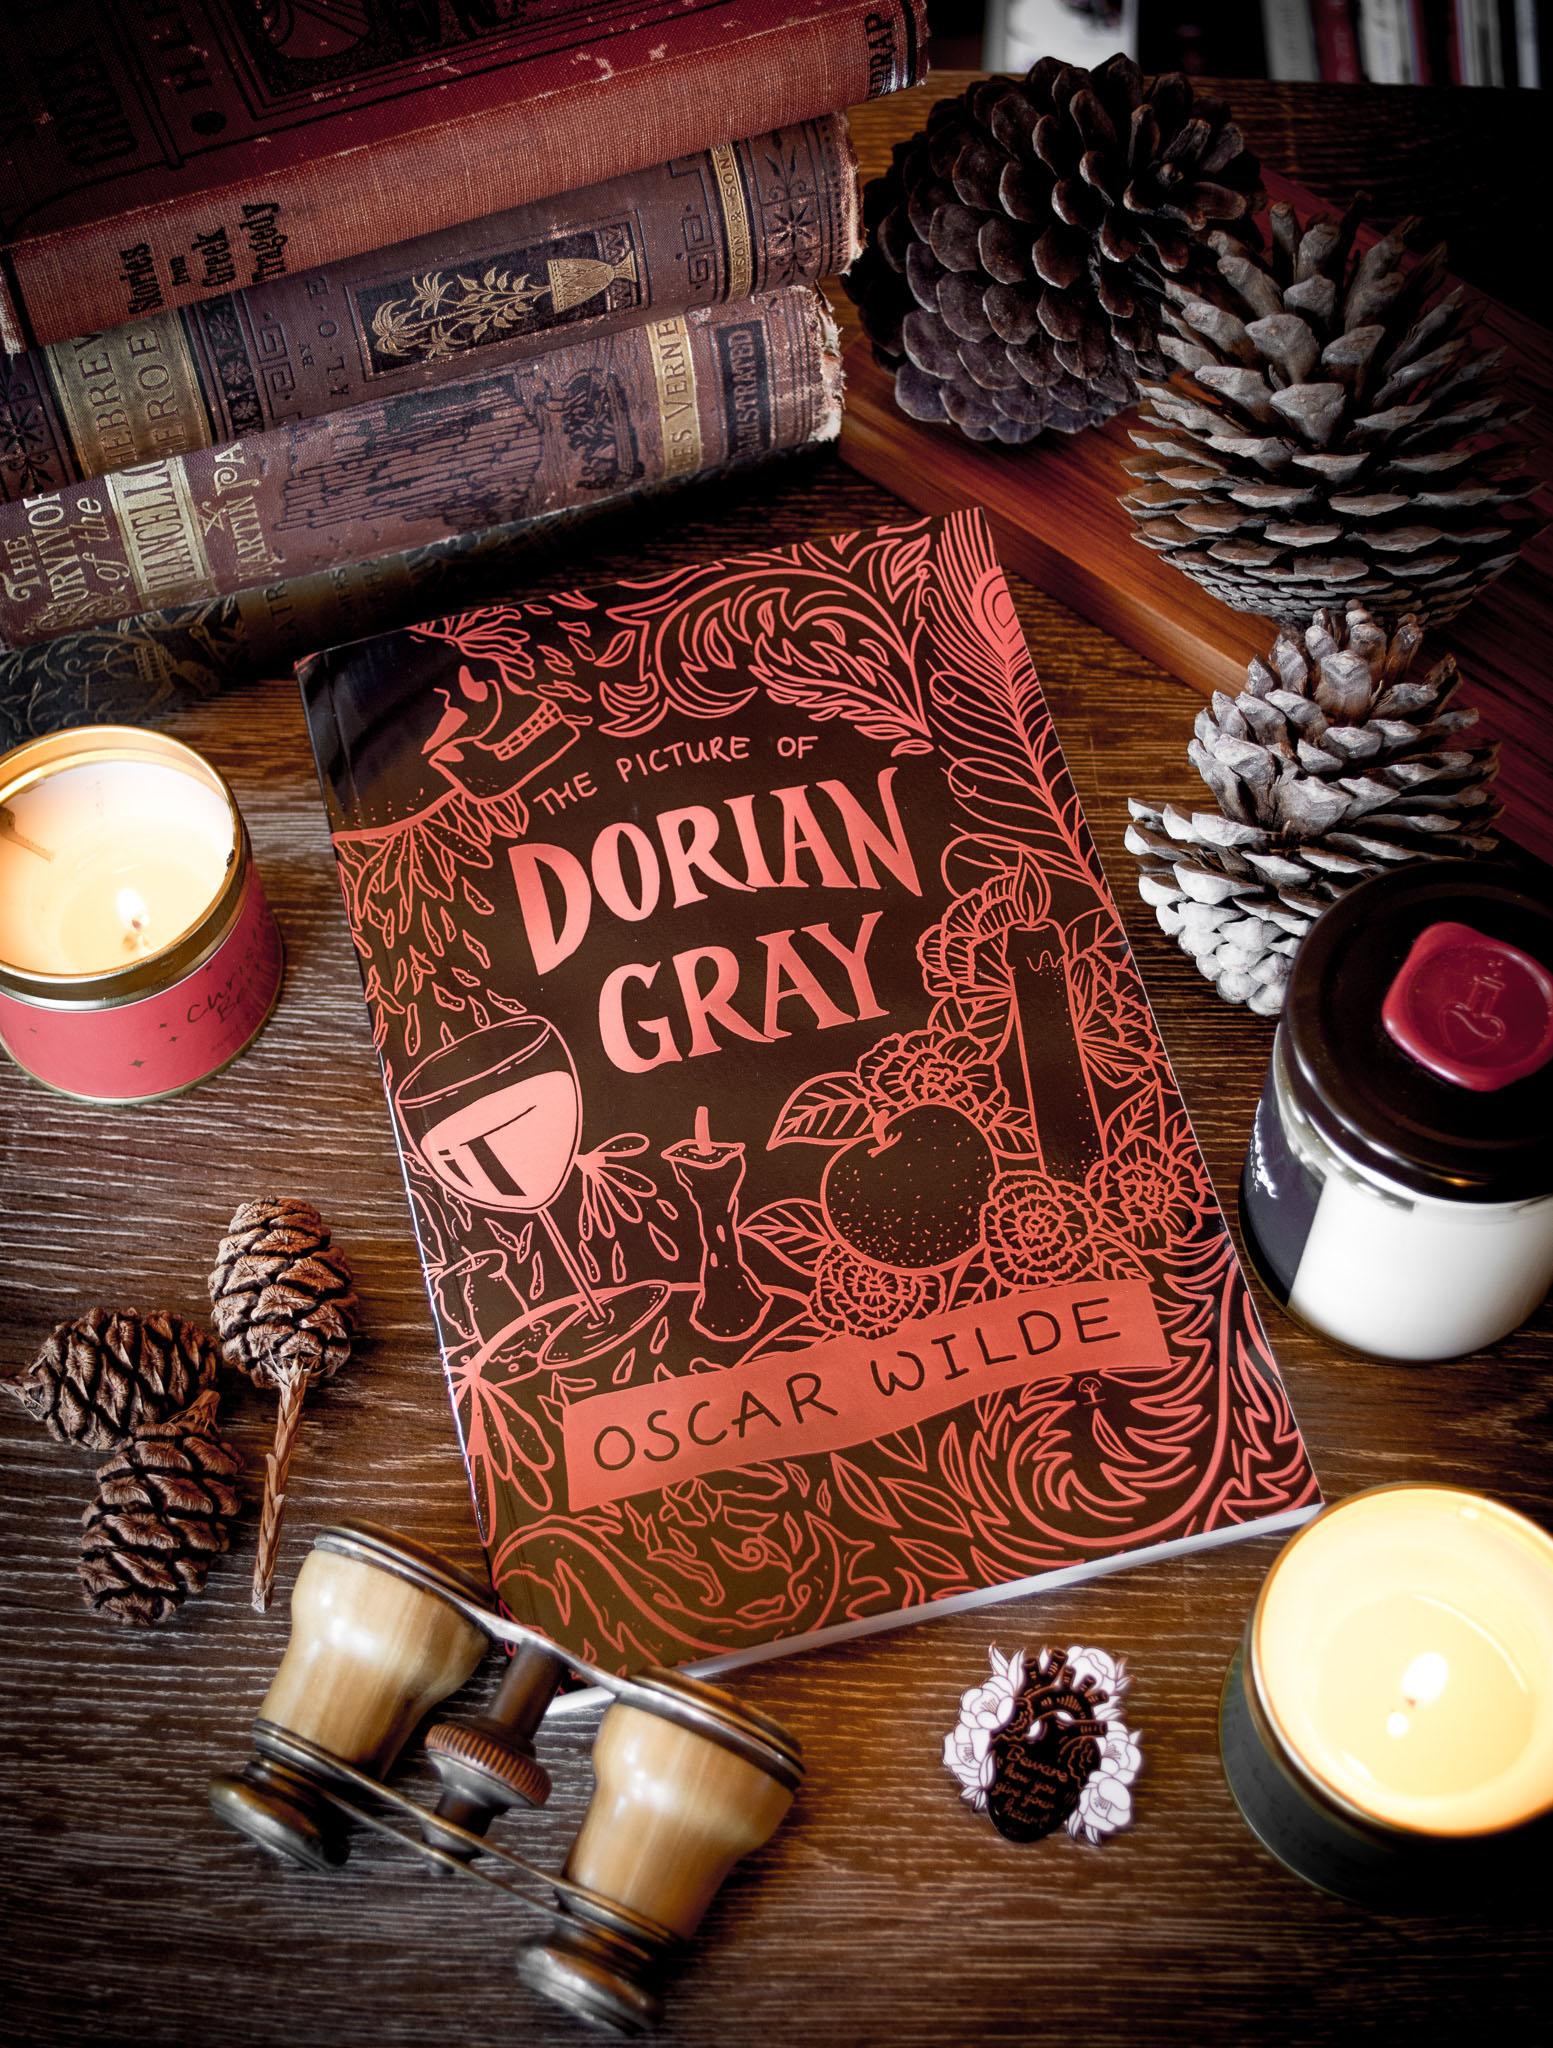 dorian_gray_book_cover_oscar_wilde_alchemy_ink_holly_dunn_design_small.jpg